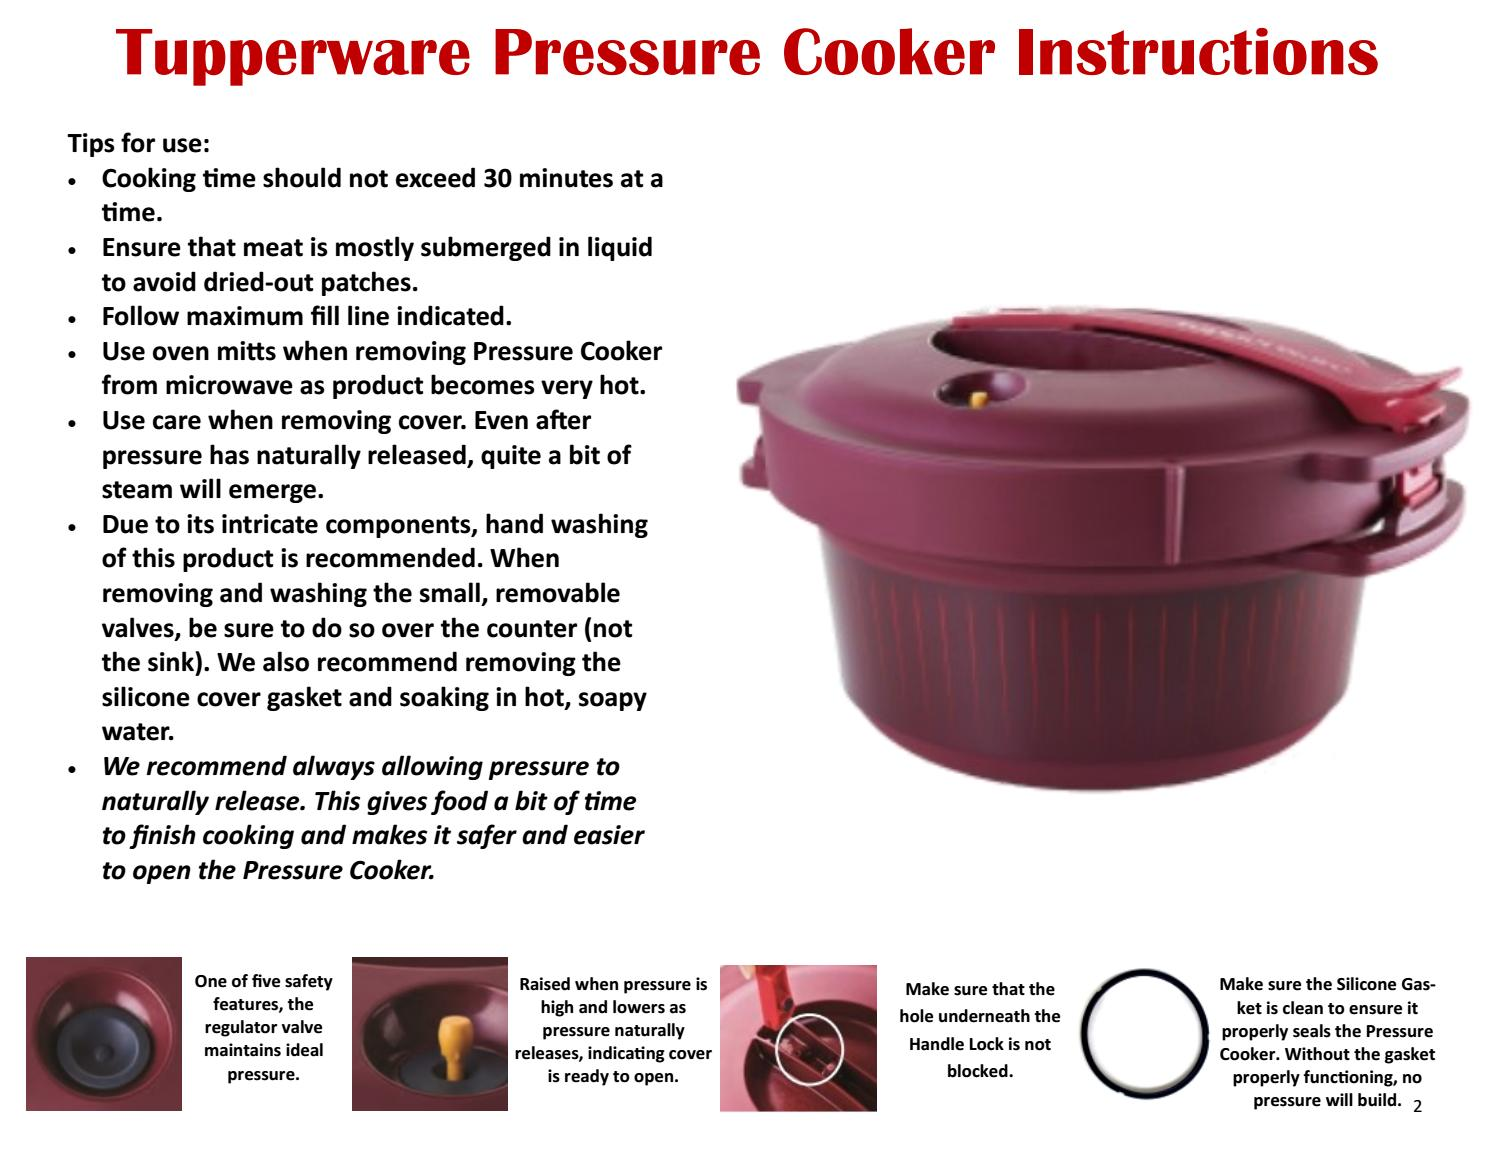 tupperware pressure cooker instructions